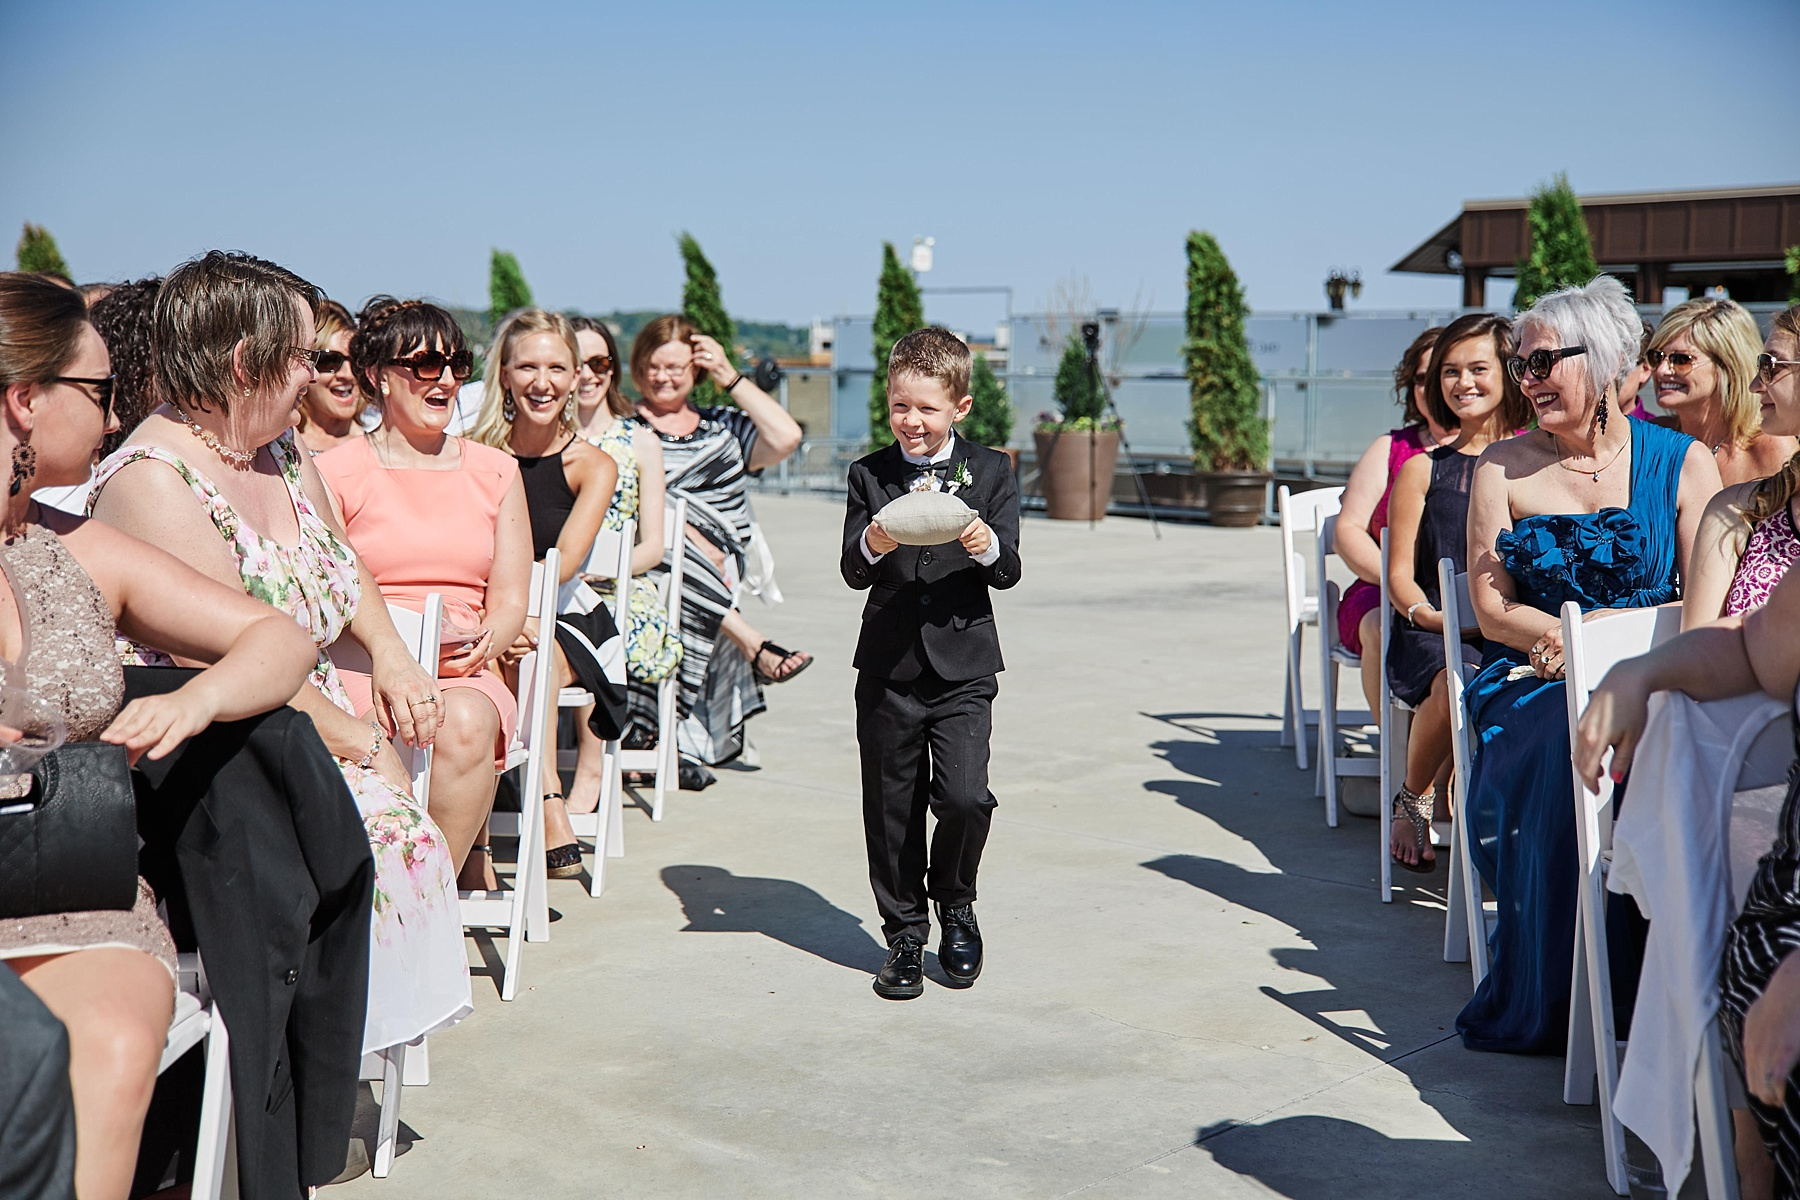 ABULAE-Wedding-Saint-paul-MN-Josh-Sofia-Wedding-Mears-Park_0746.jpg